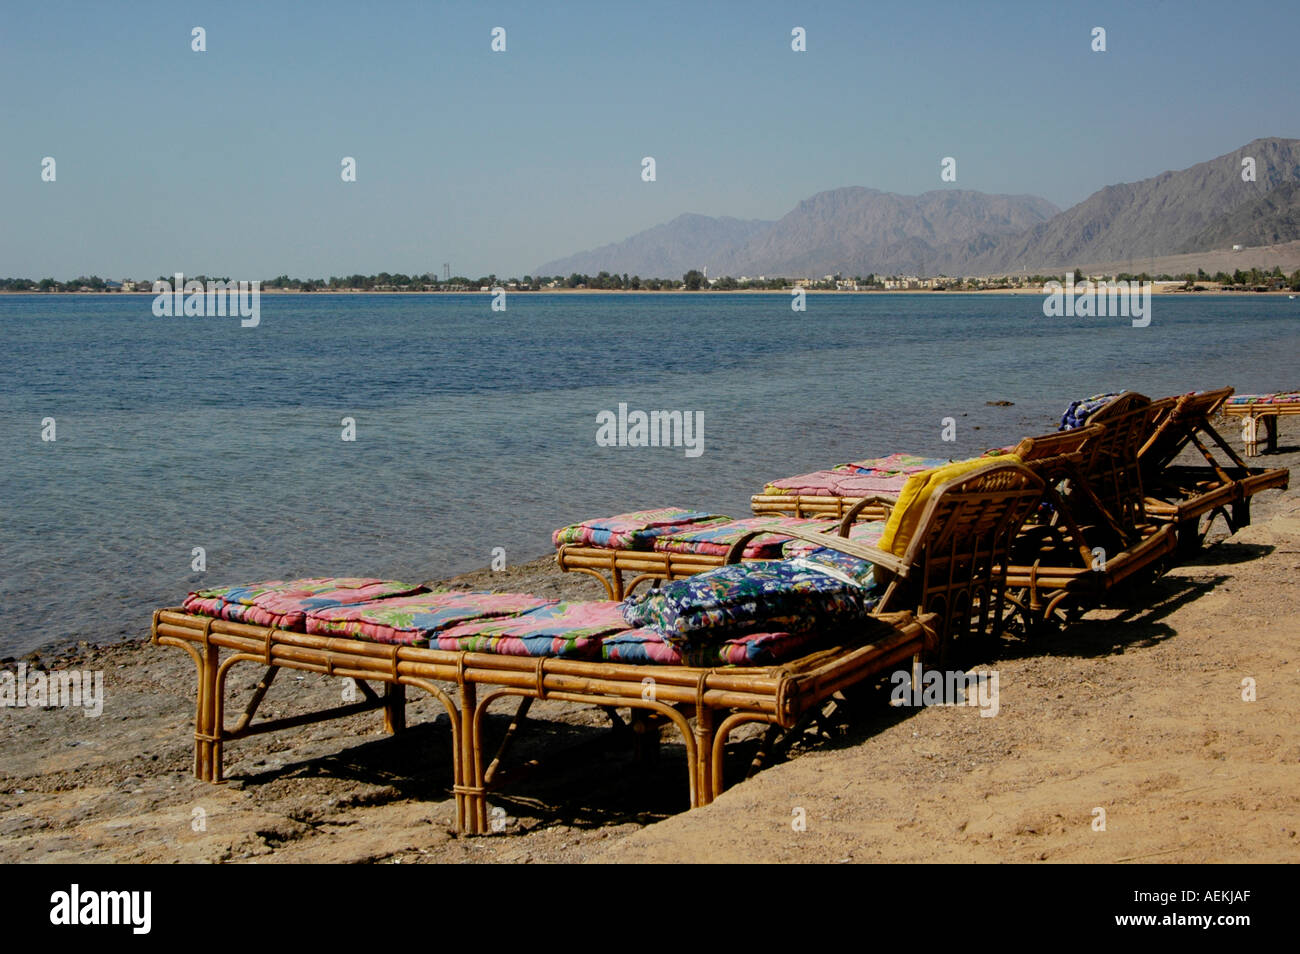 Empty sun loungers in Nuweiba Tarabin beach in Nuweiba also spelled: Nueiba a coastal town in the eastern part of Sinai Peninsula, Egypt - Stock Image